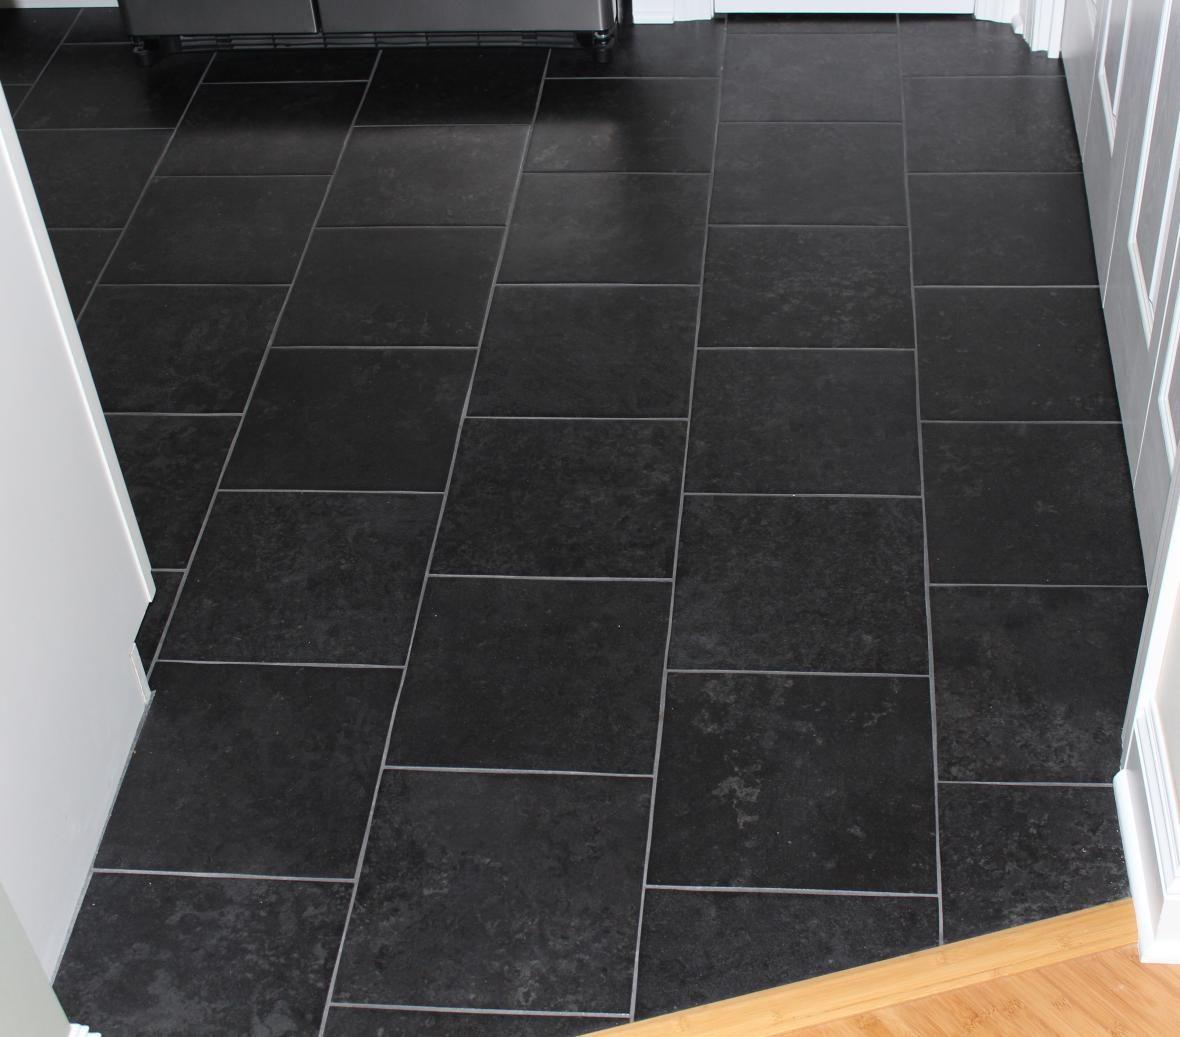 Kitchen floor tiles black photo 3 home decor pinterest kitchen floor tiles black photo 3 doublecrazyfo Image collections